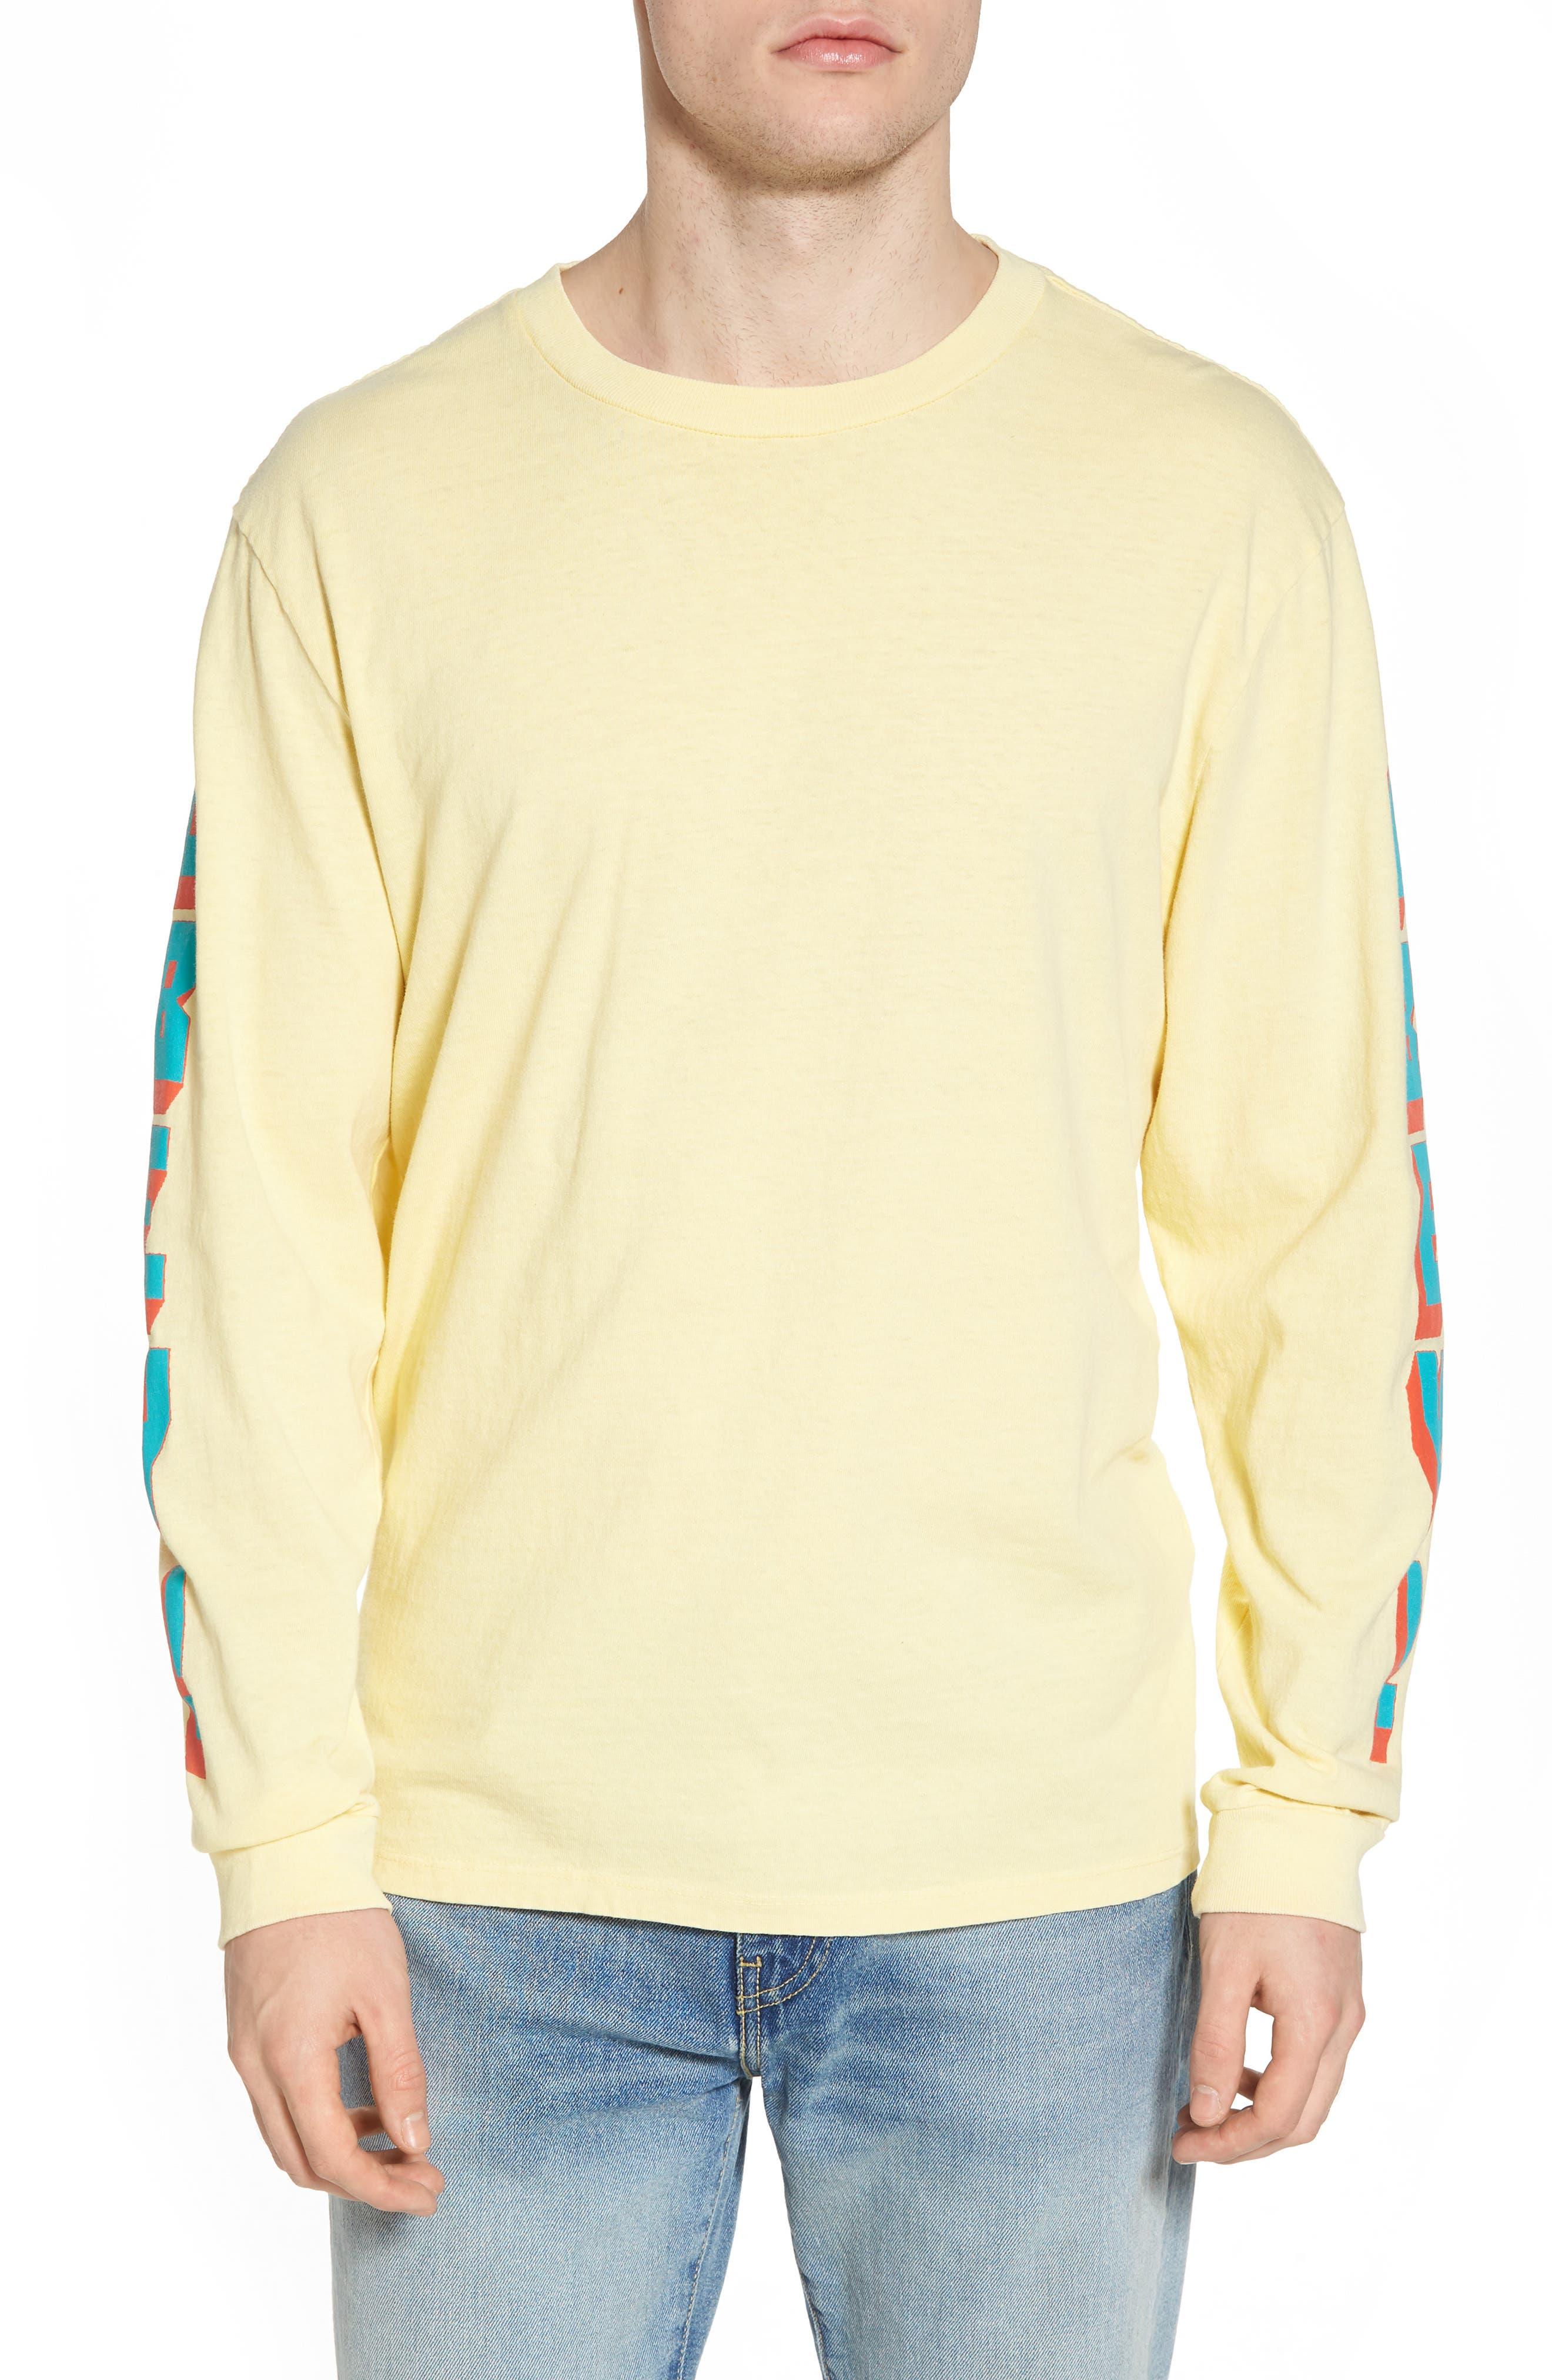 New World II Pigment T-Shirt,                             Main thumbnail 1, color,                             Dusty Lemon